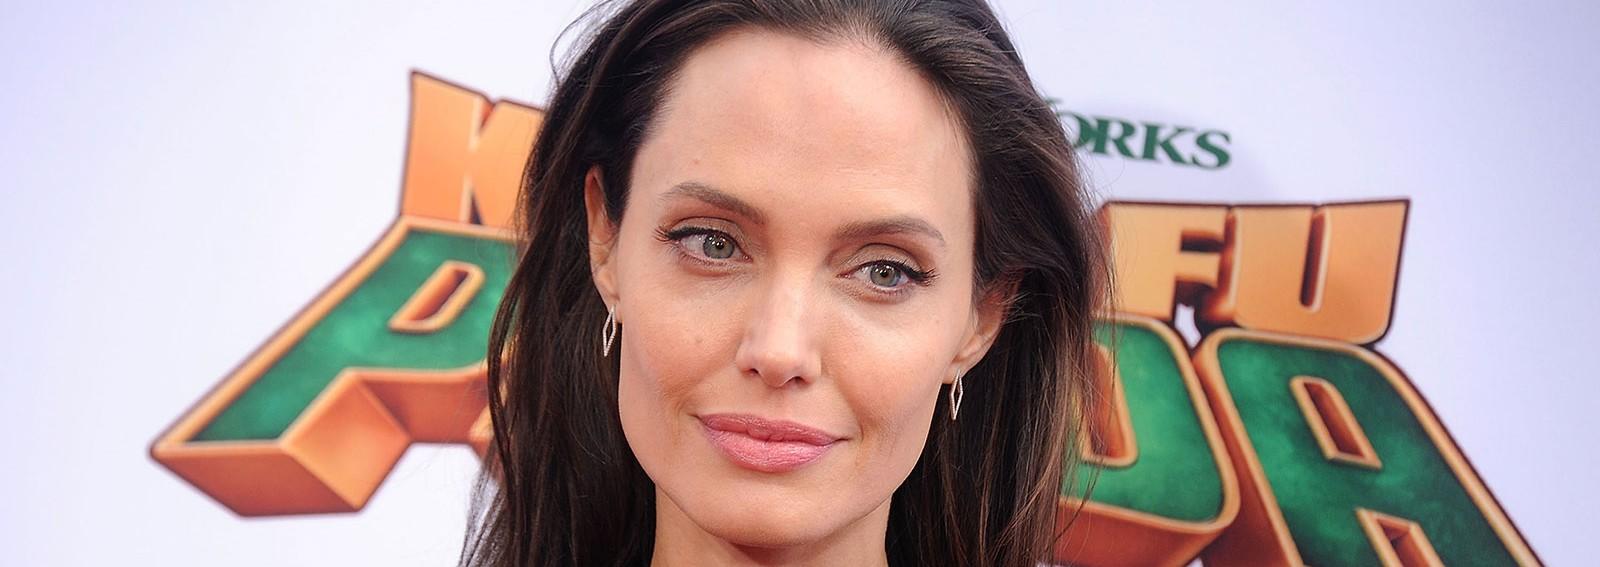 Angelina Jolie debuts three new tattoos